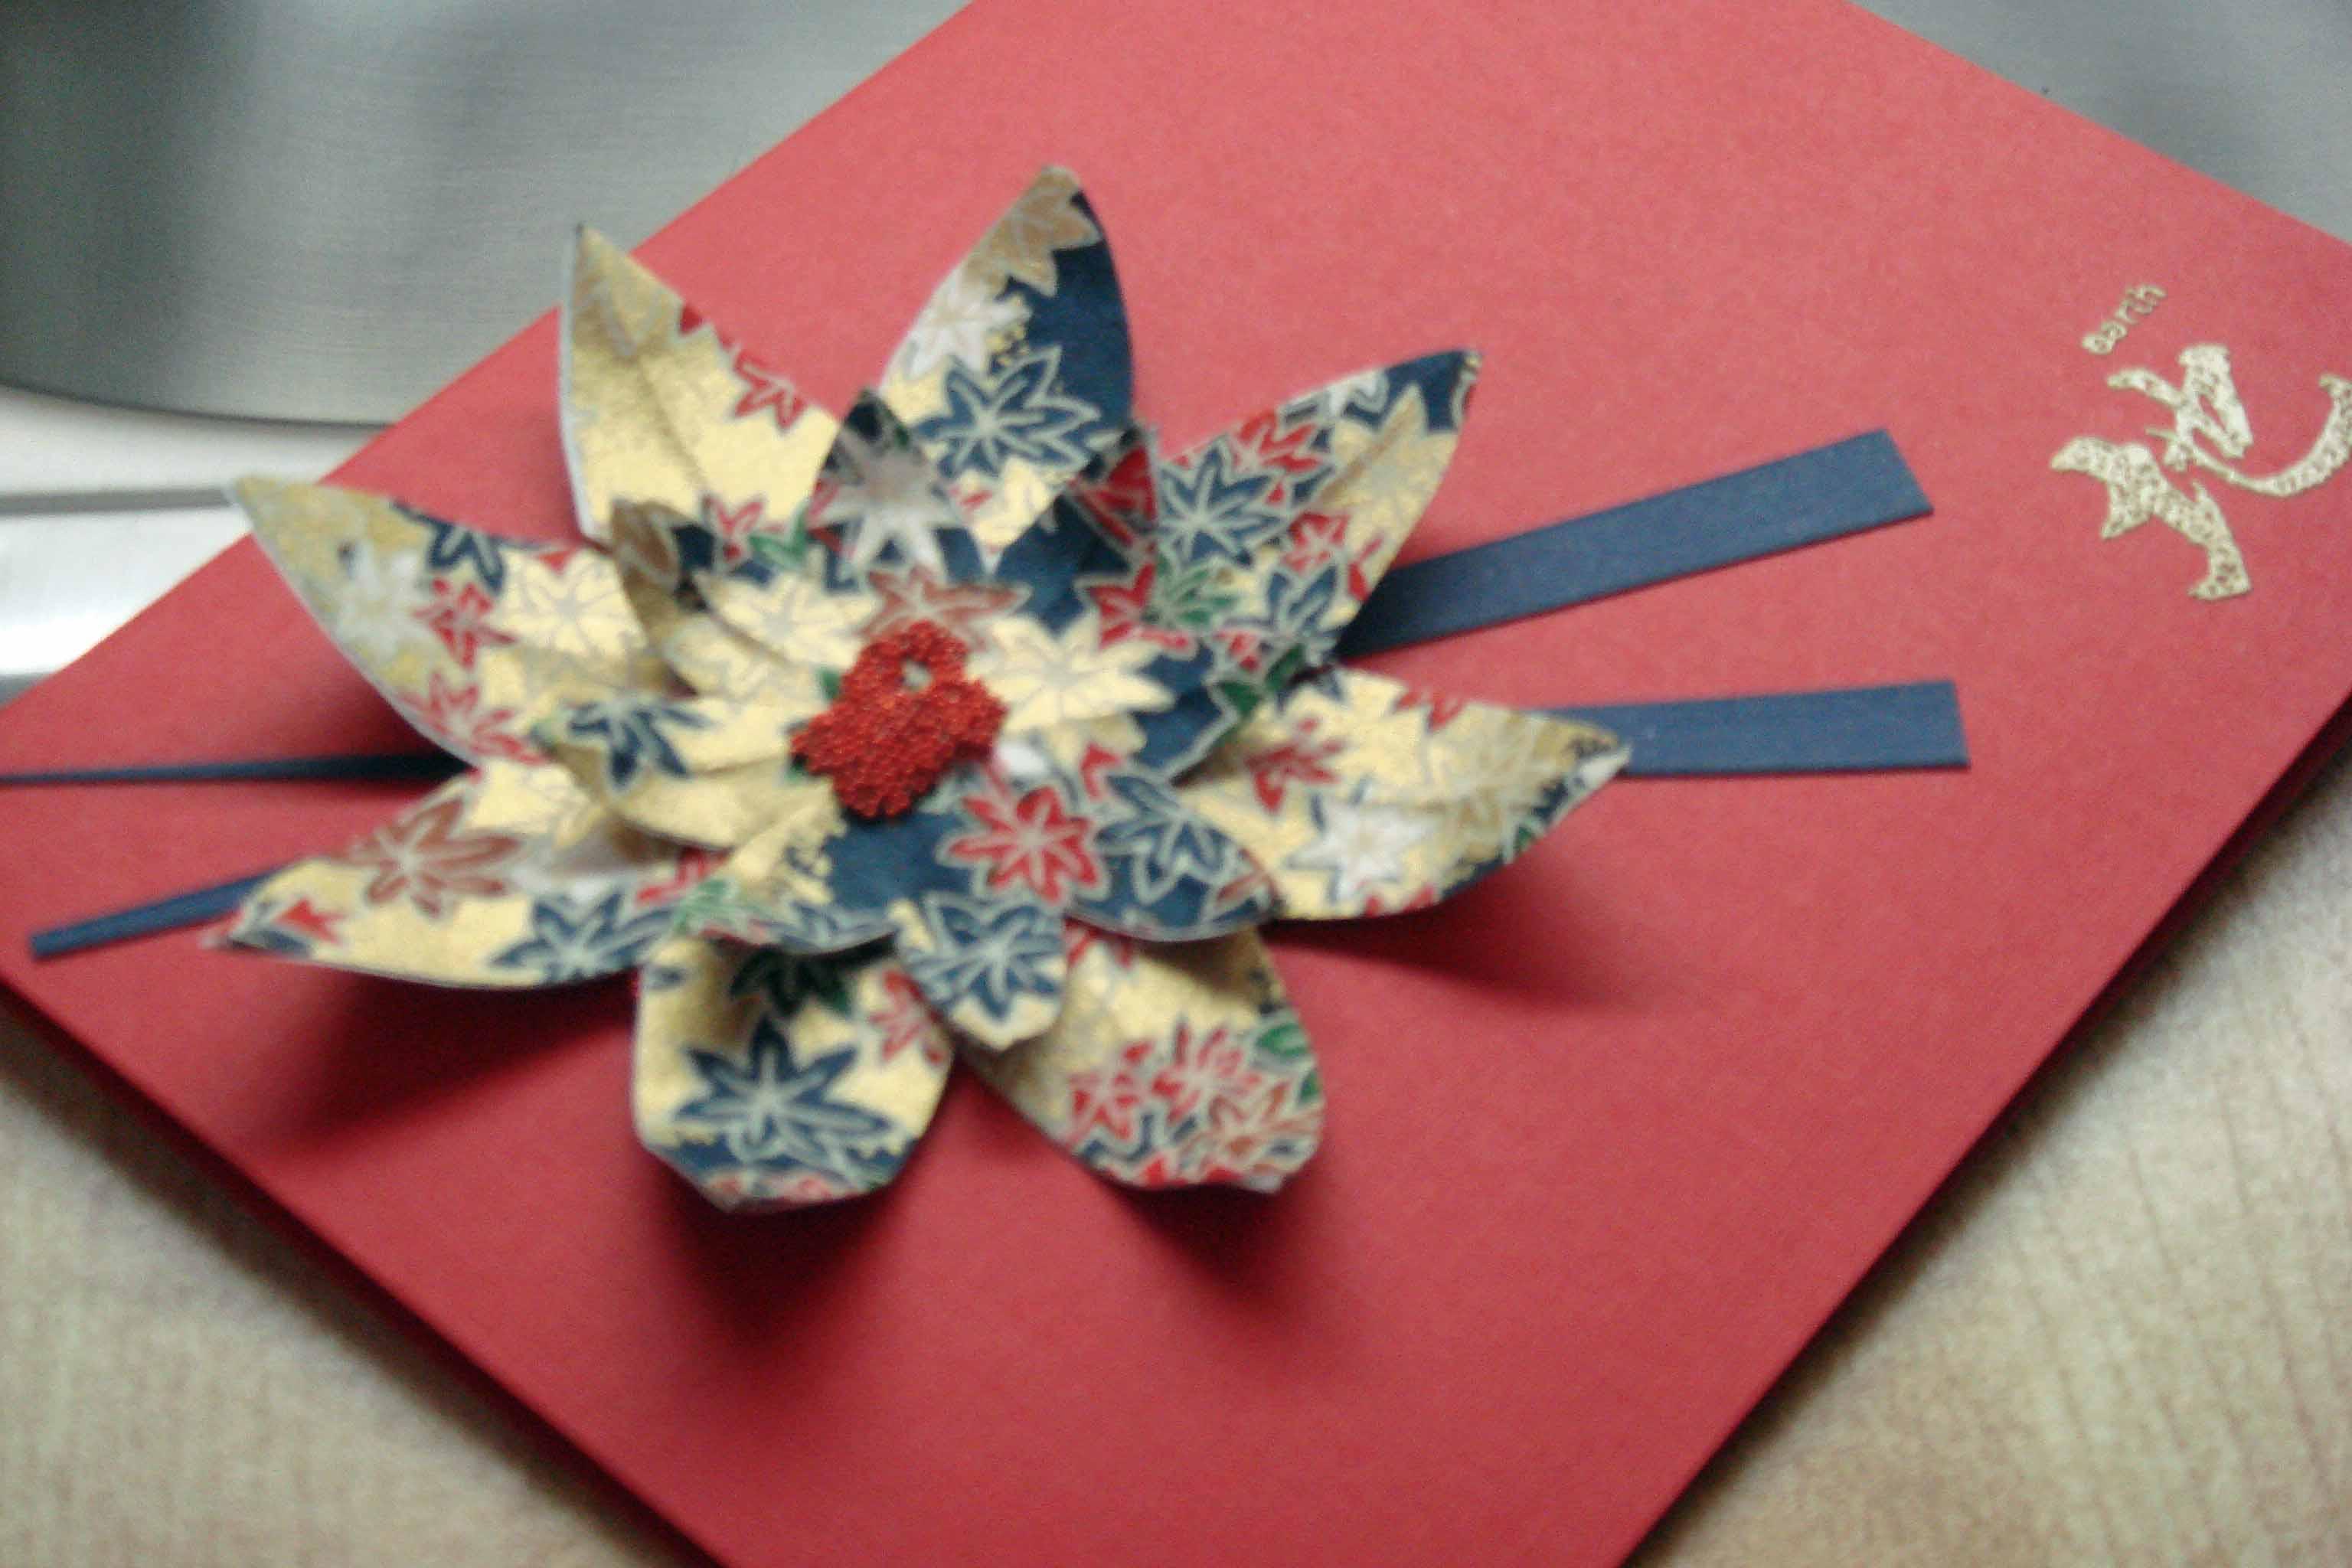 hanko flower card 2 close up